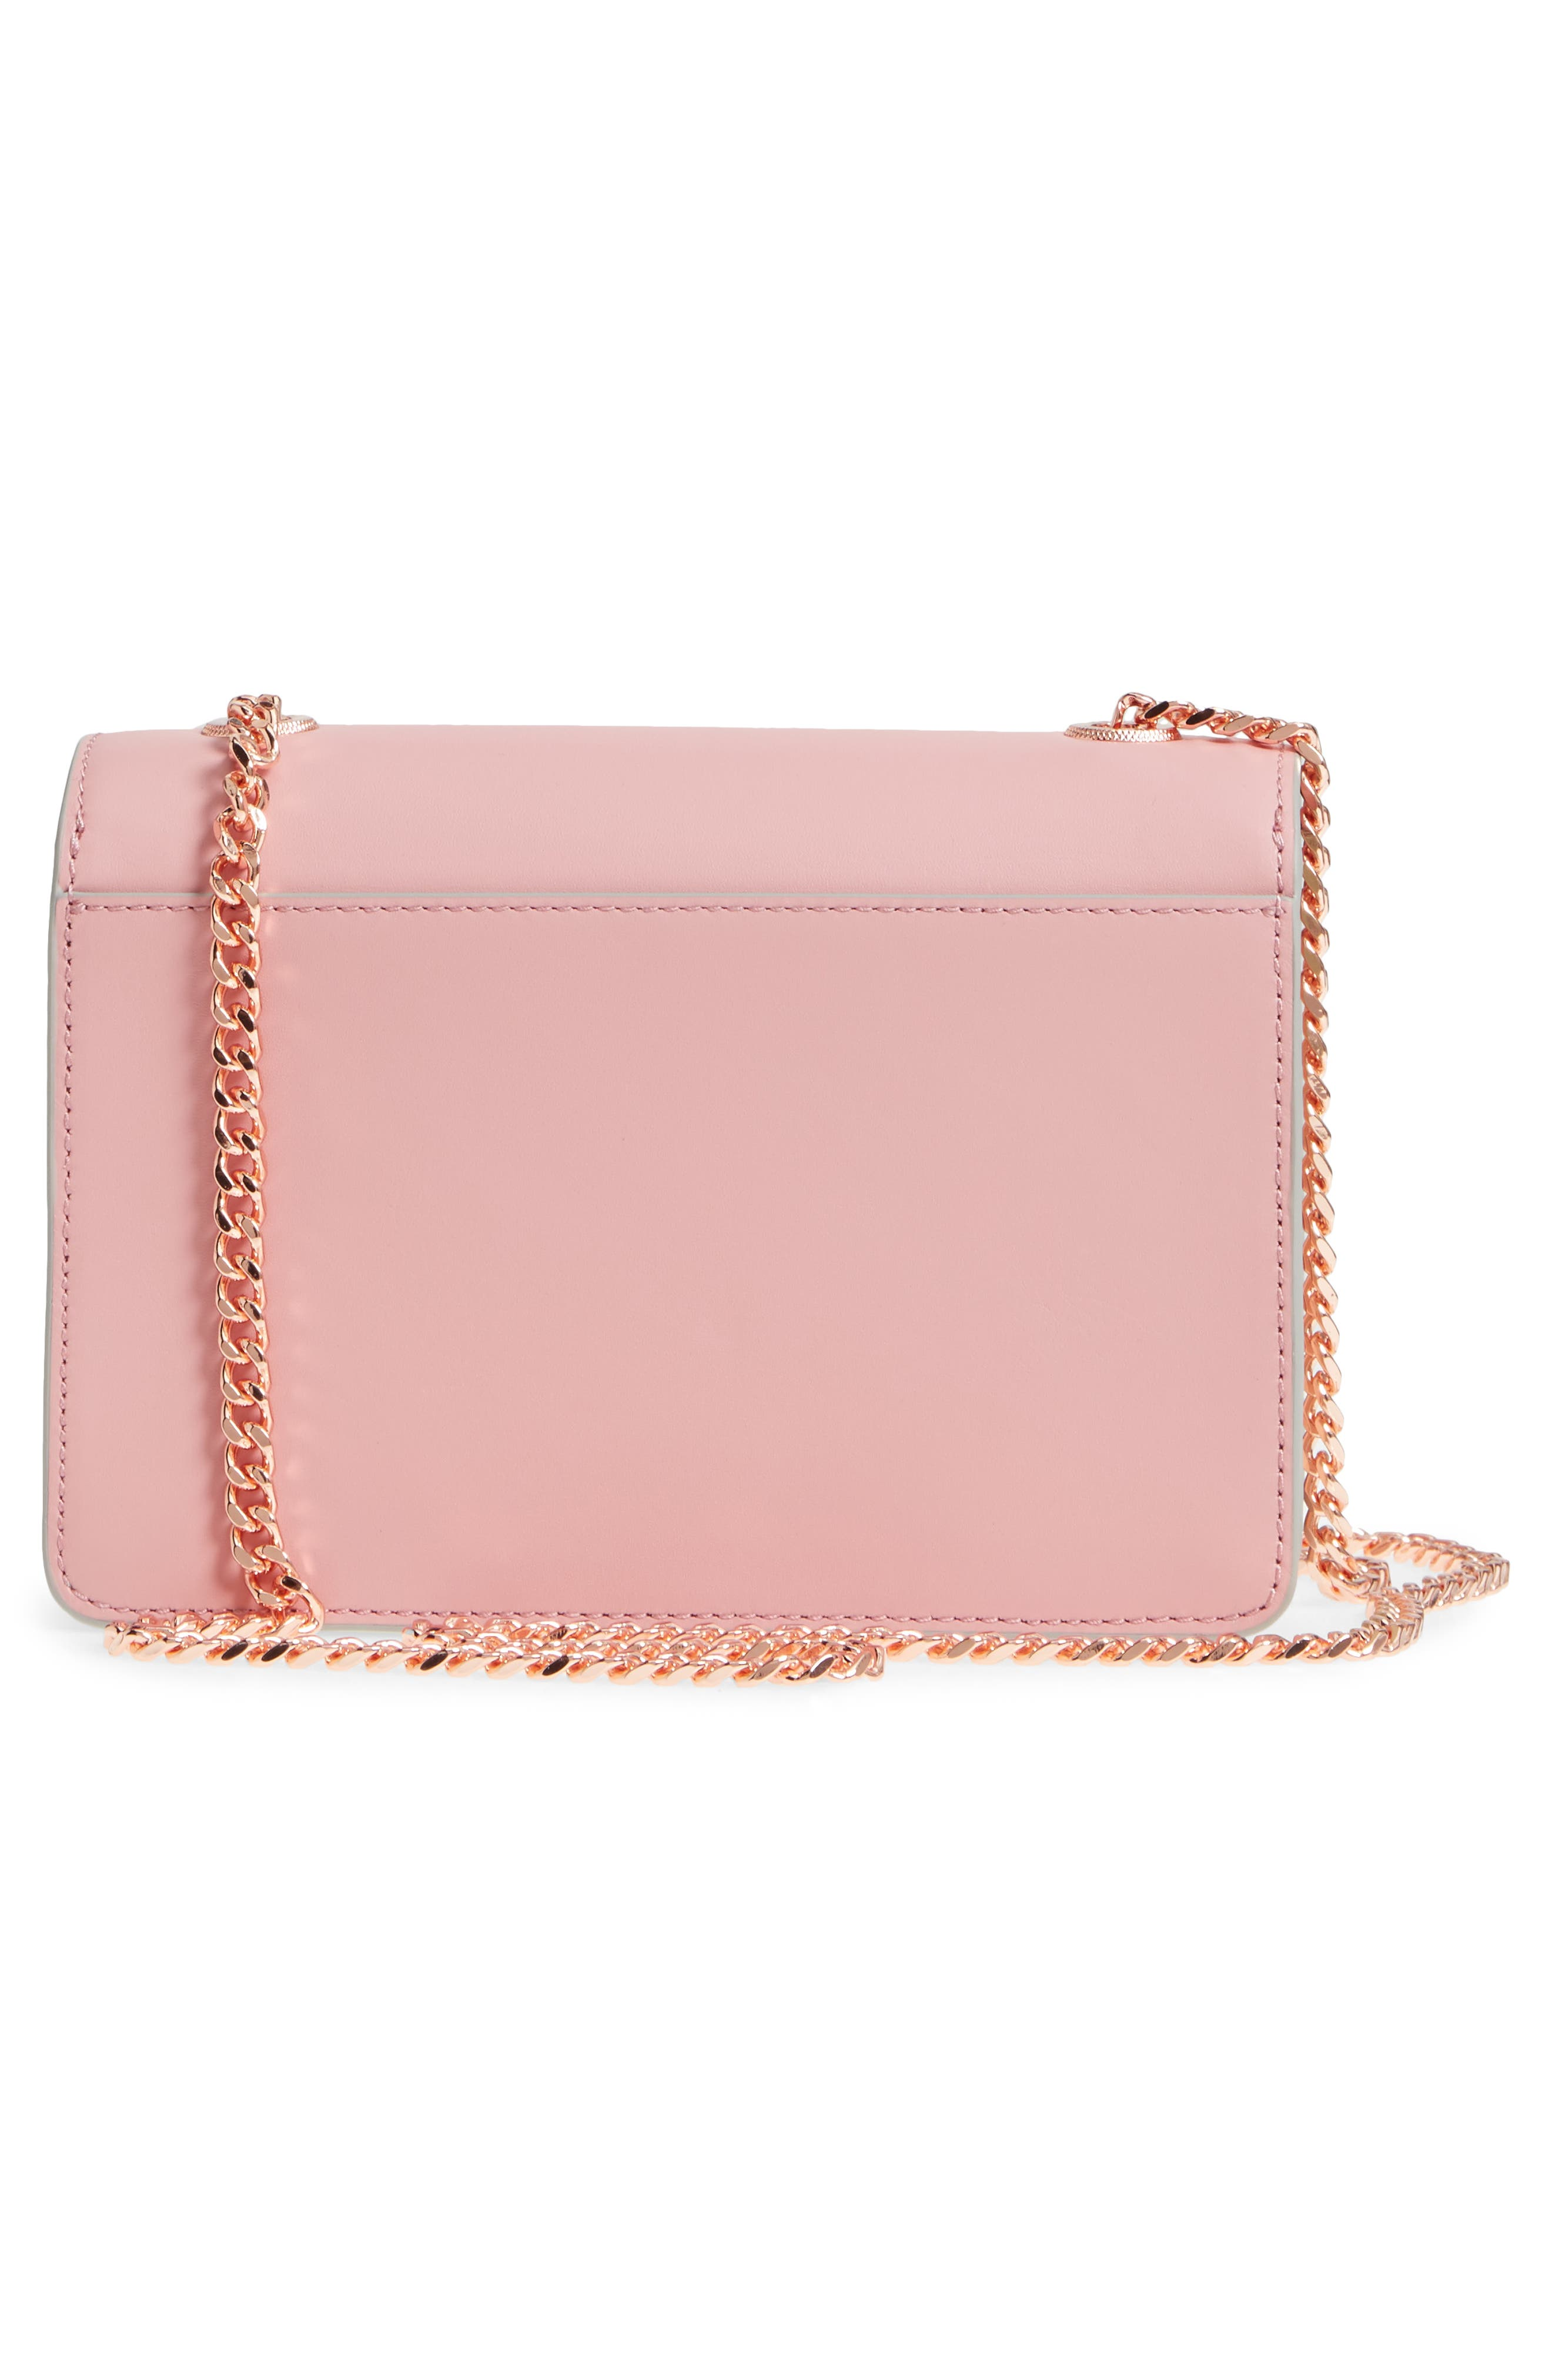 Earie Leather Crossbody Bag,                             Alternate thumbnail 3, color,                             Dusky Pink